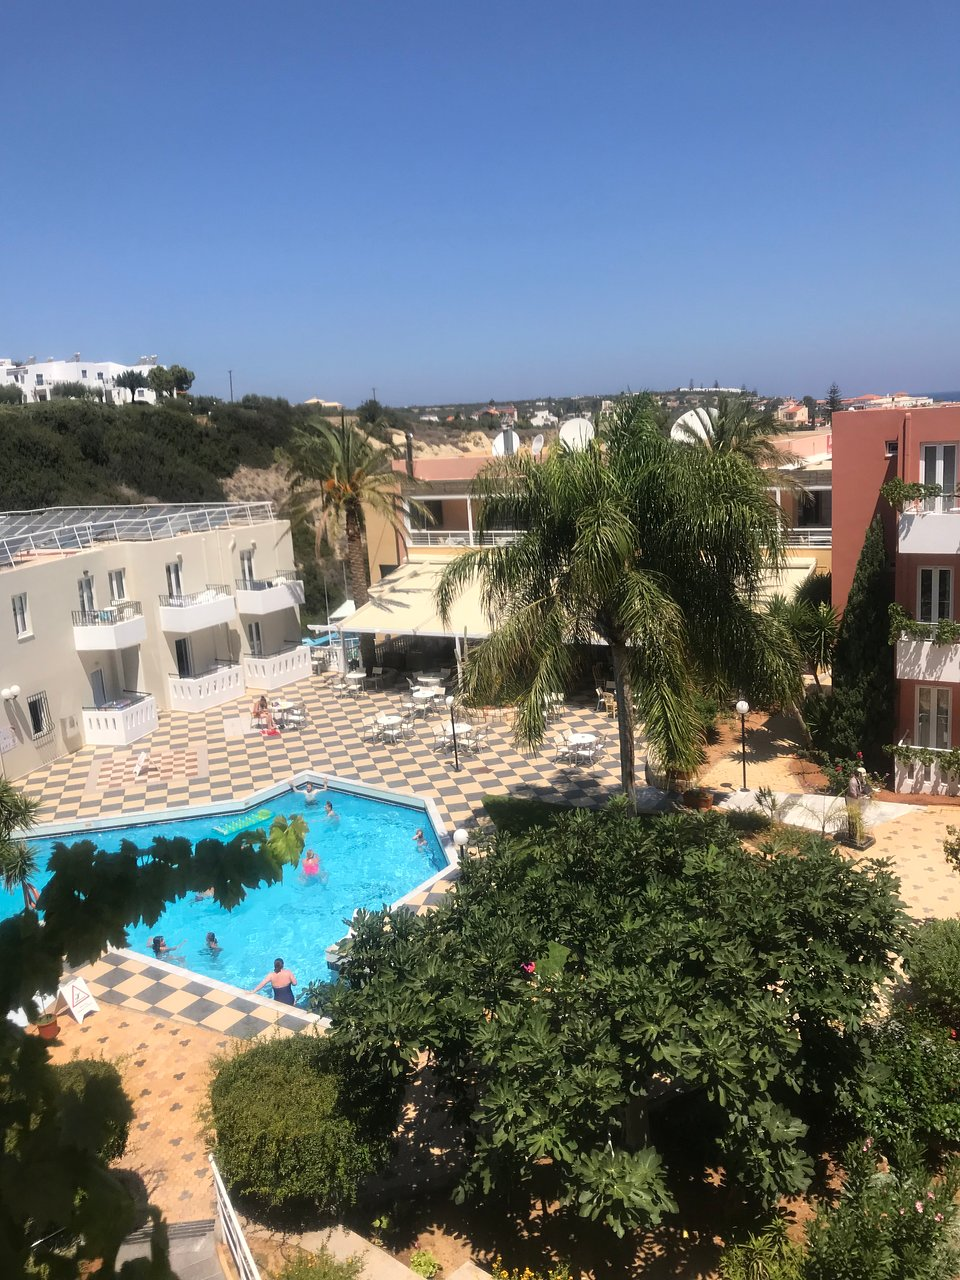 Bellos Apartments Studios Updated 2019 Prices Hotel Reviews Crete Greece Tripadvisor